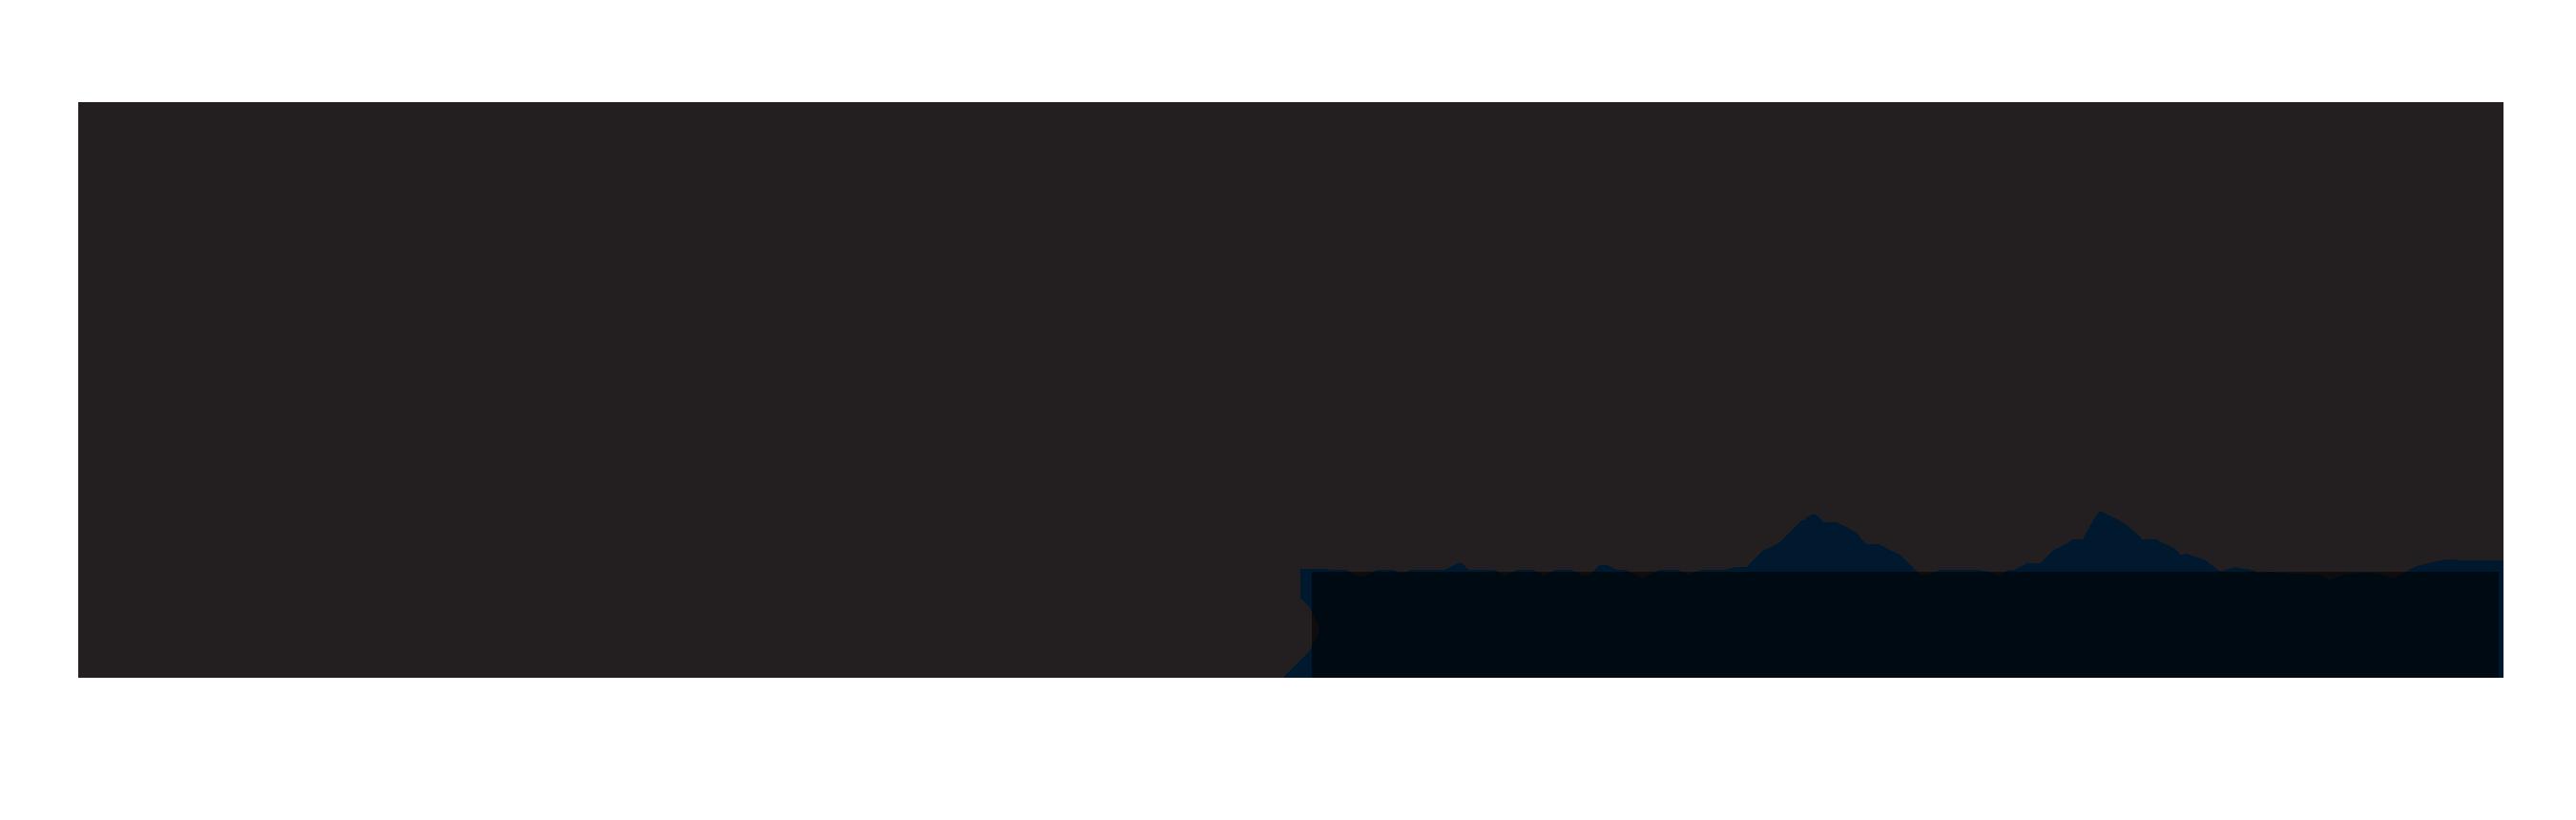 Crains Business New York